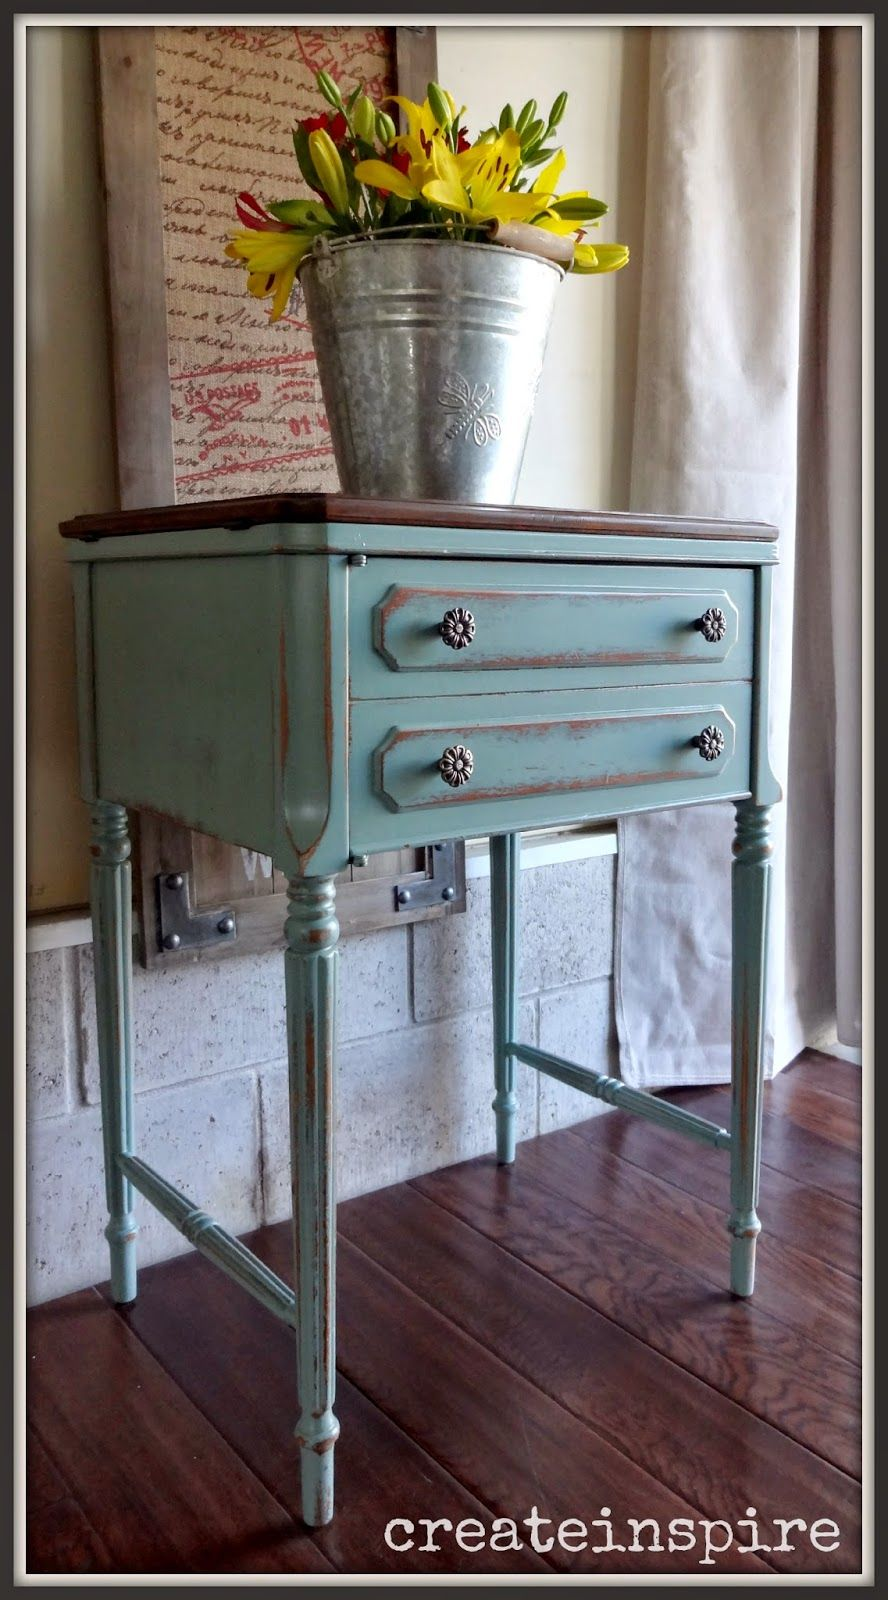 Createinspire Antique Sewing Machine V Sewing Machine